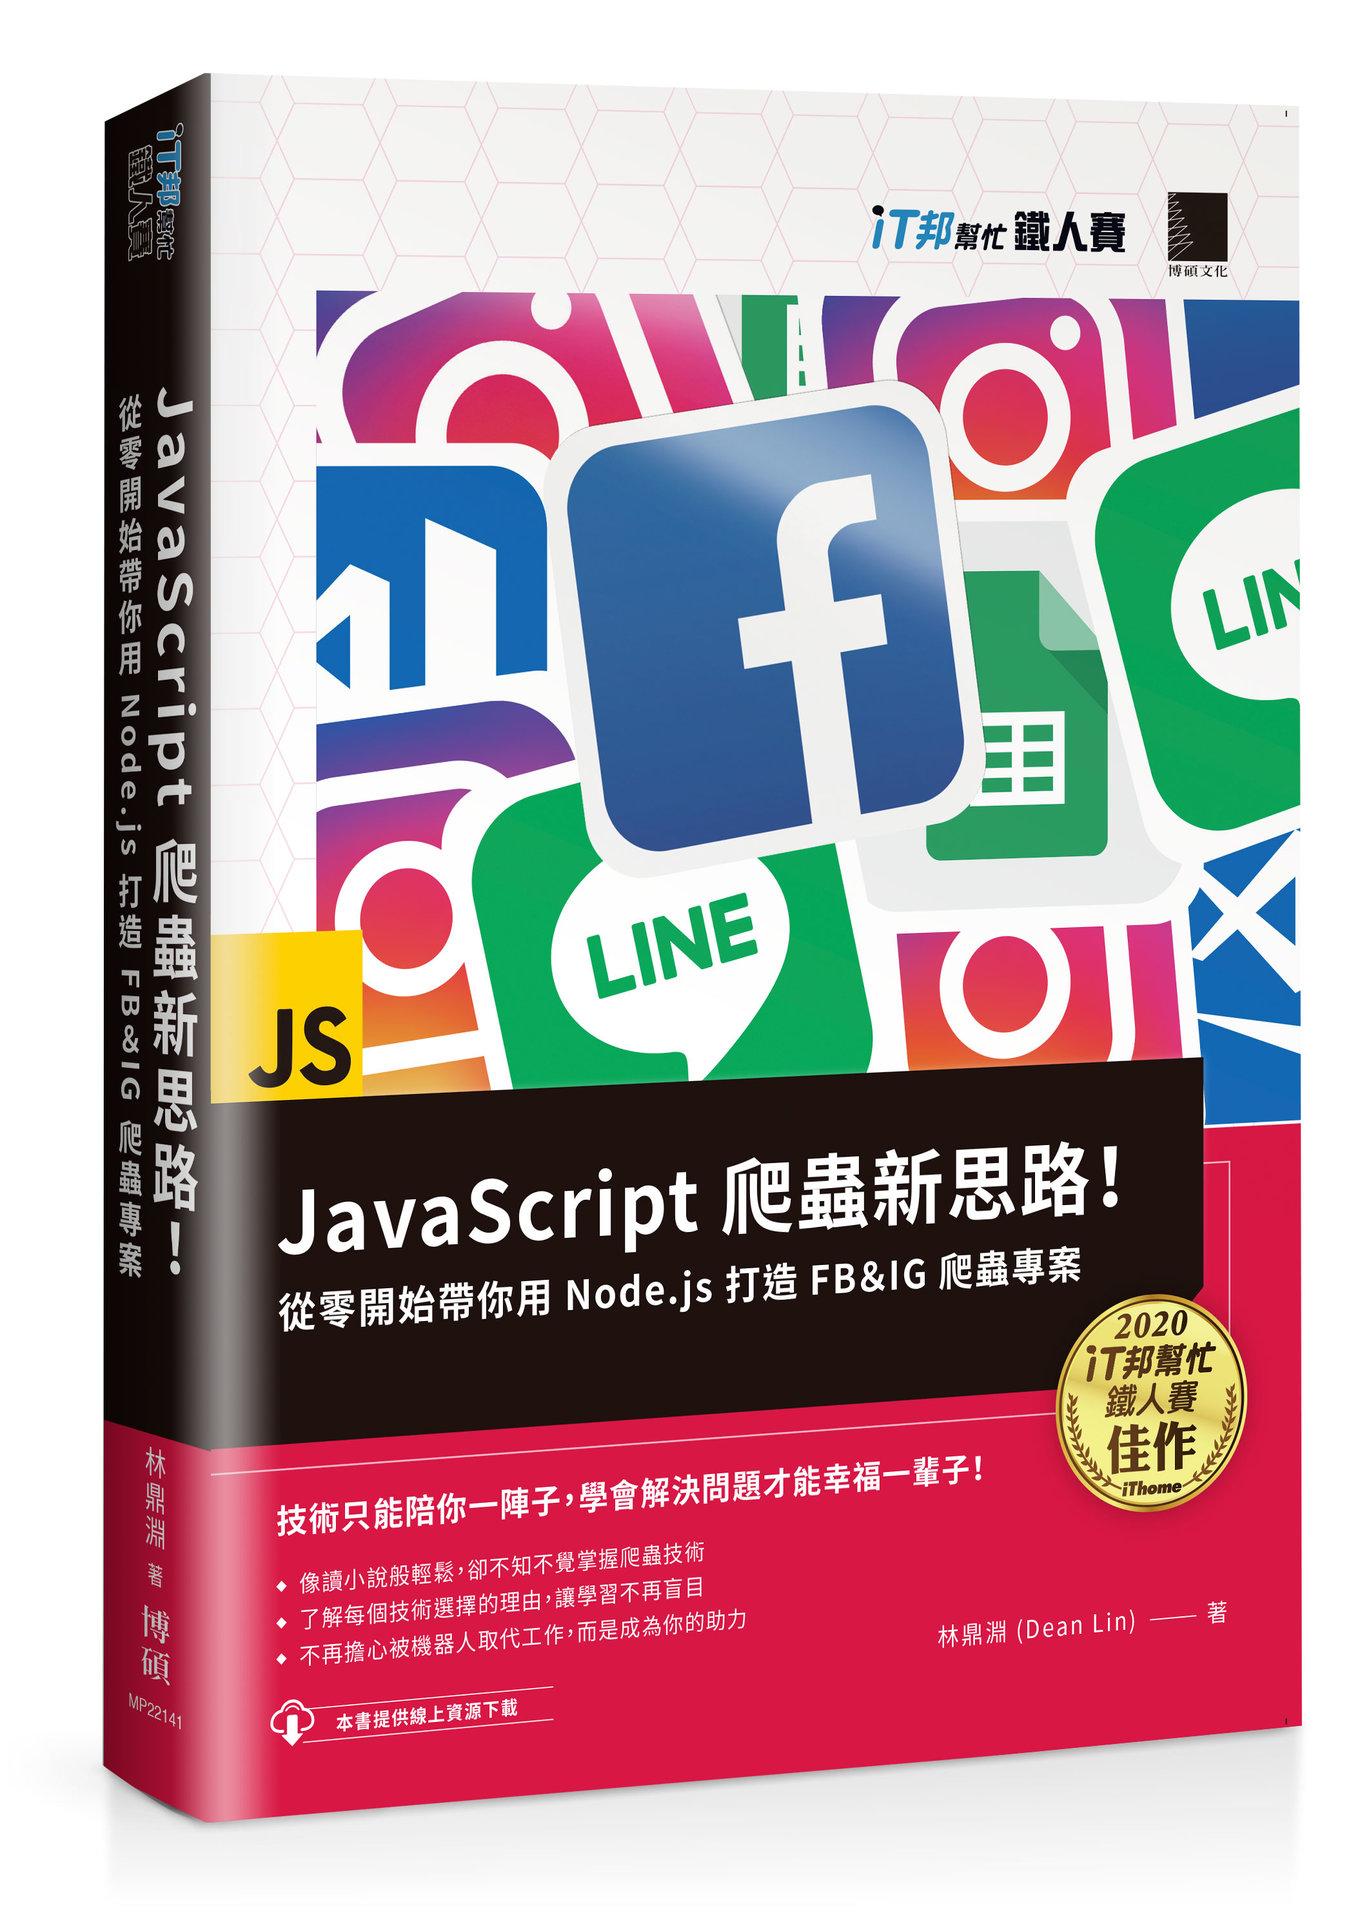 JavaScript 爬蟲新思路!從零開始帶你用 Node.js 打造 FB&IG 爬蟲專案(iT邦幫忙鐵人賽系列書)-preview-1